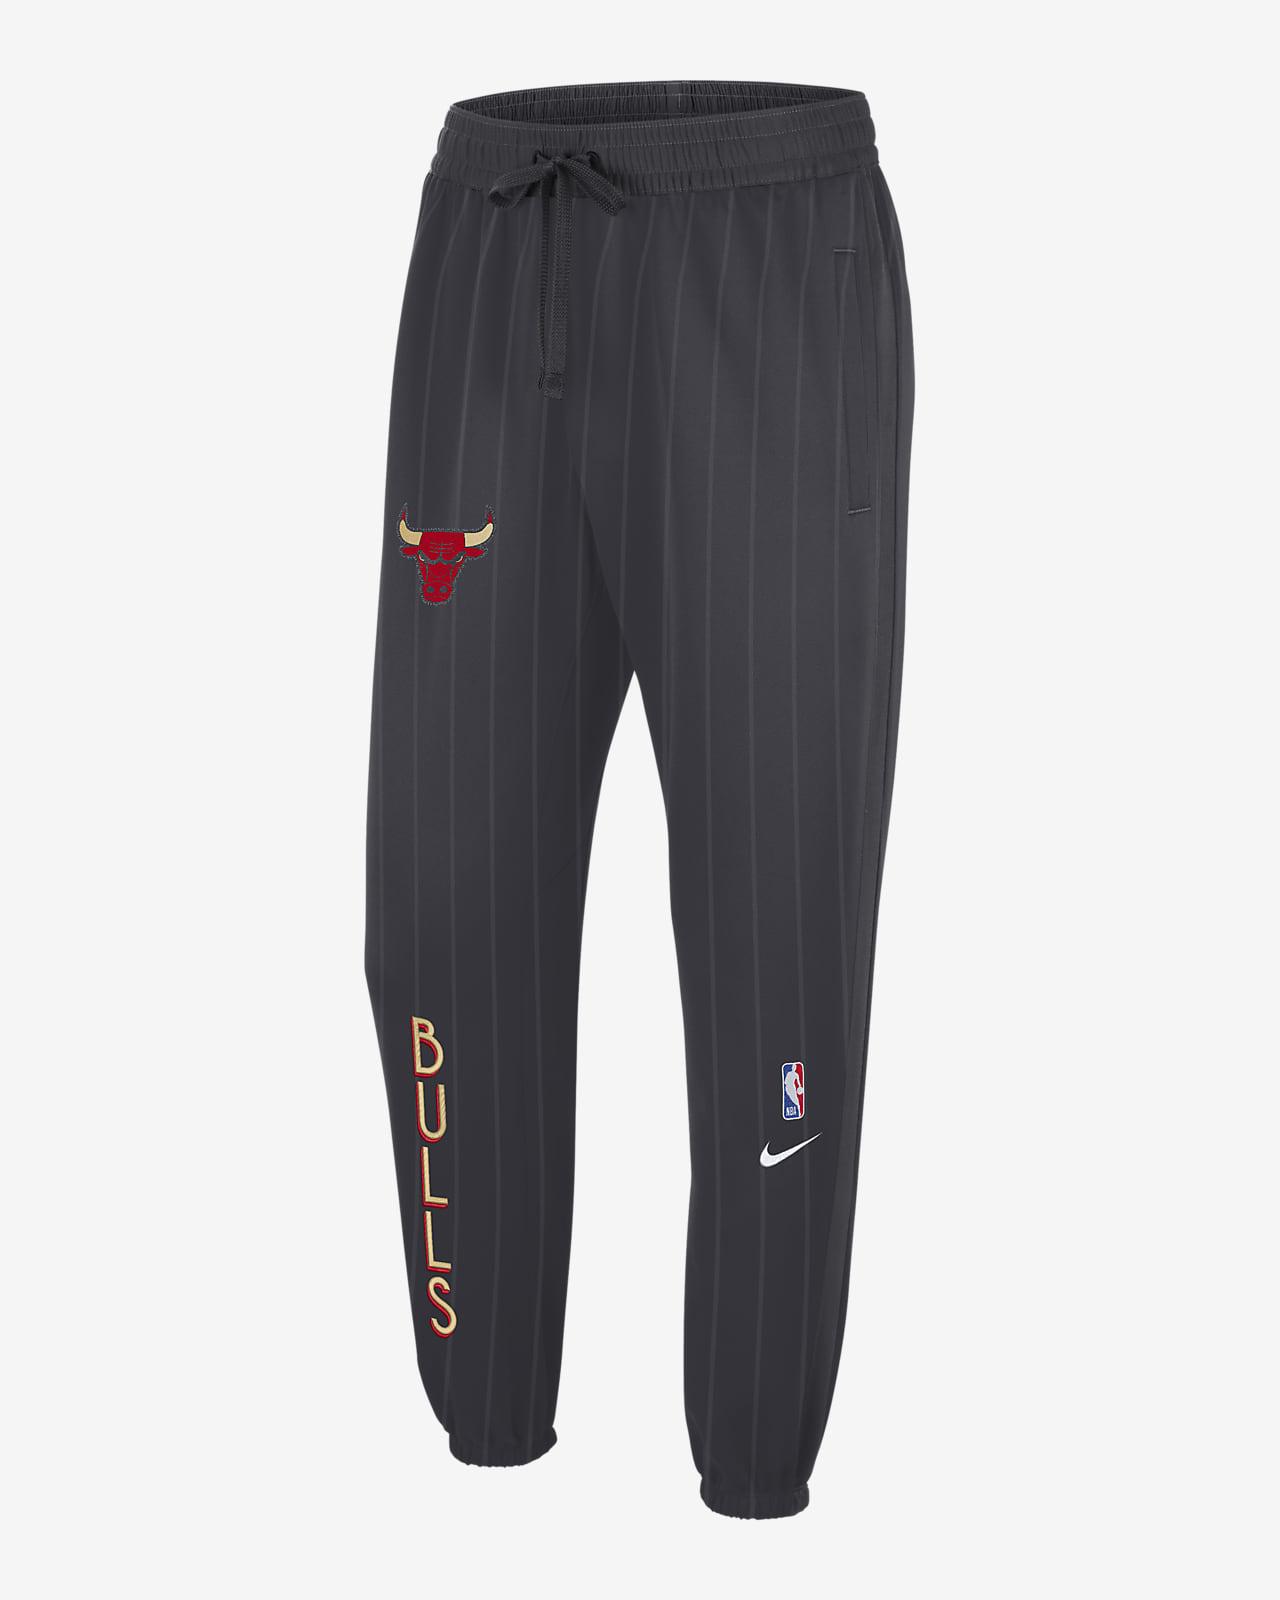 Chicago Bulls Showtime City Edition Nike Therma Flex NBA-Hose für Herren